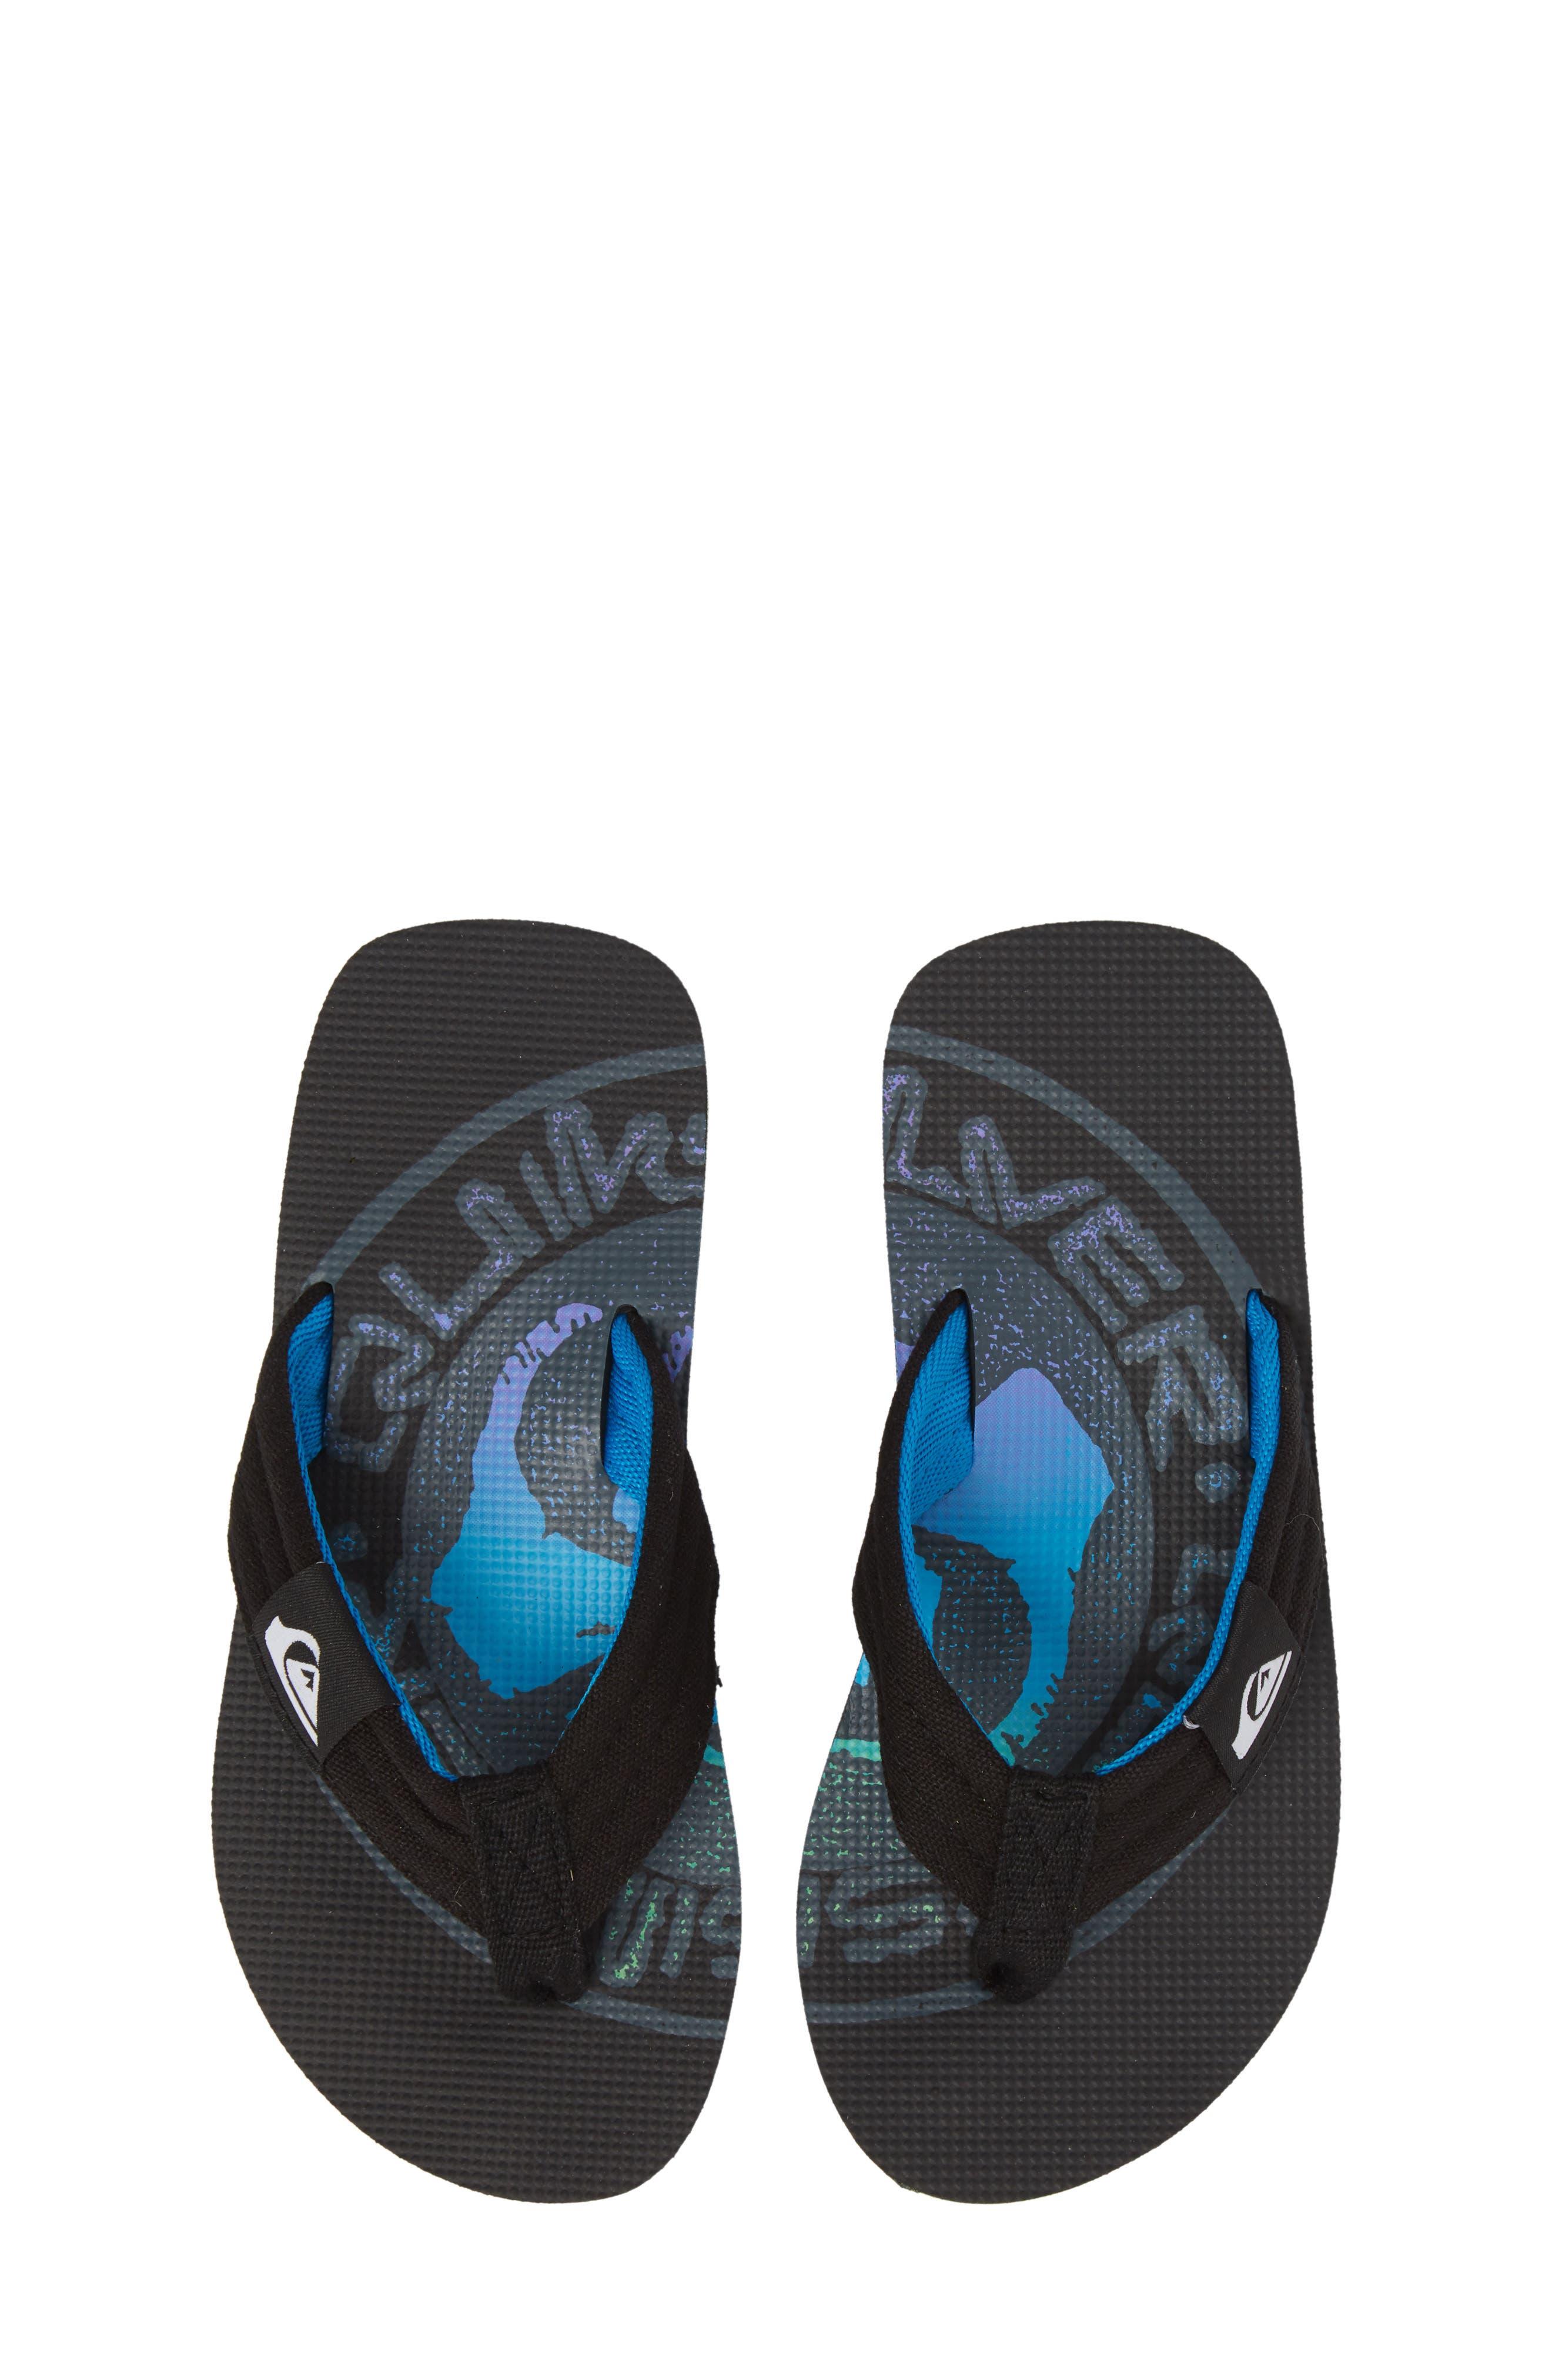 Quiksilver Molokai Layback Flip Flop (Toddler, Little Kid & Big Kid)